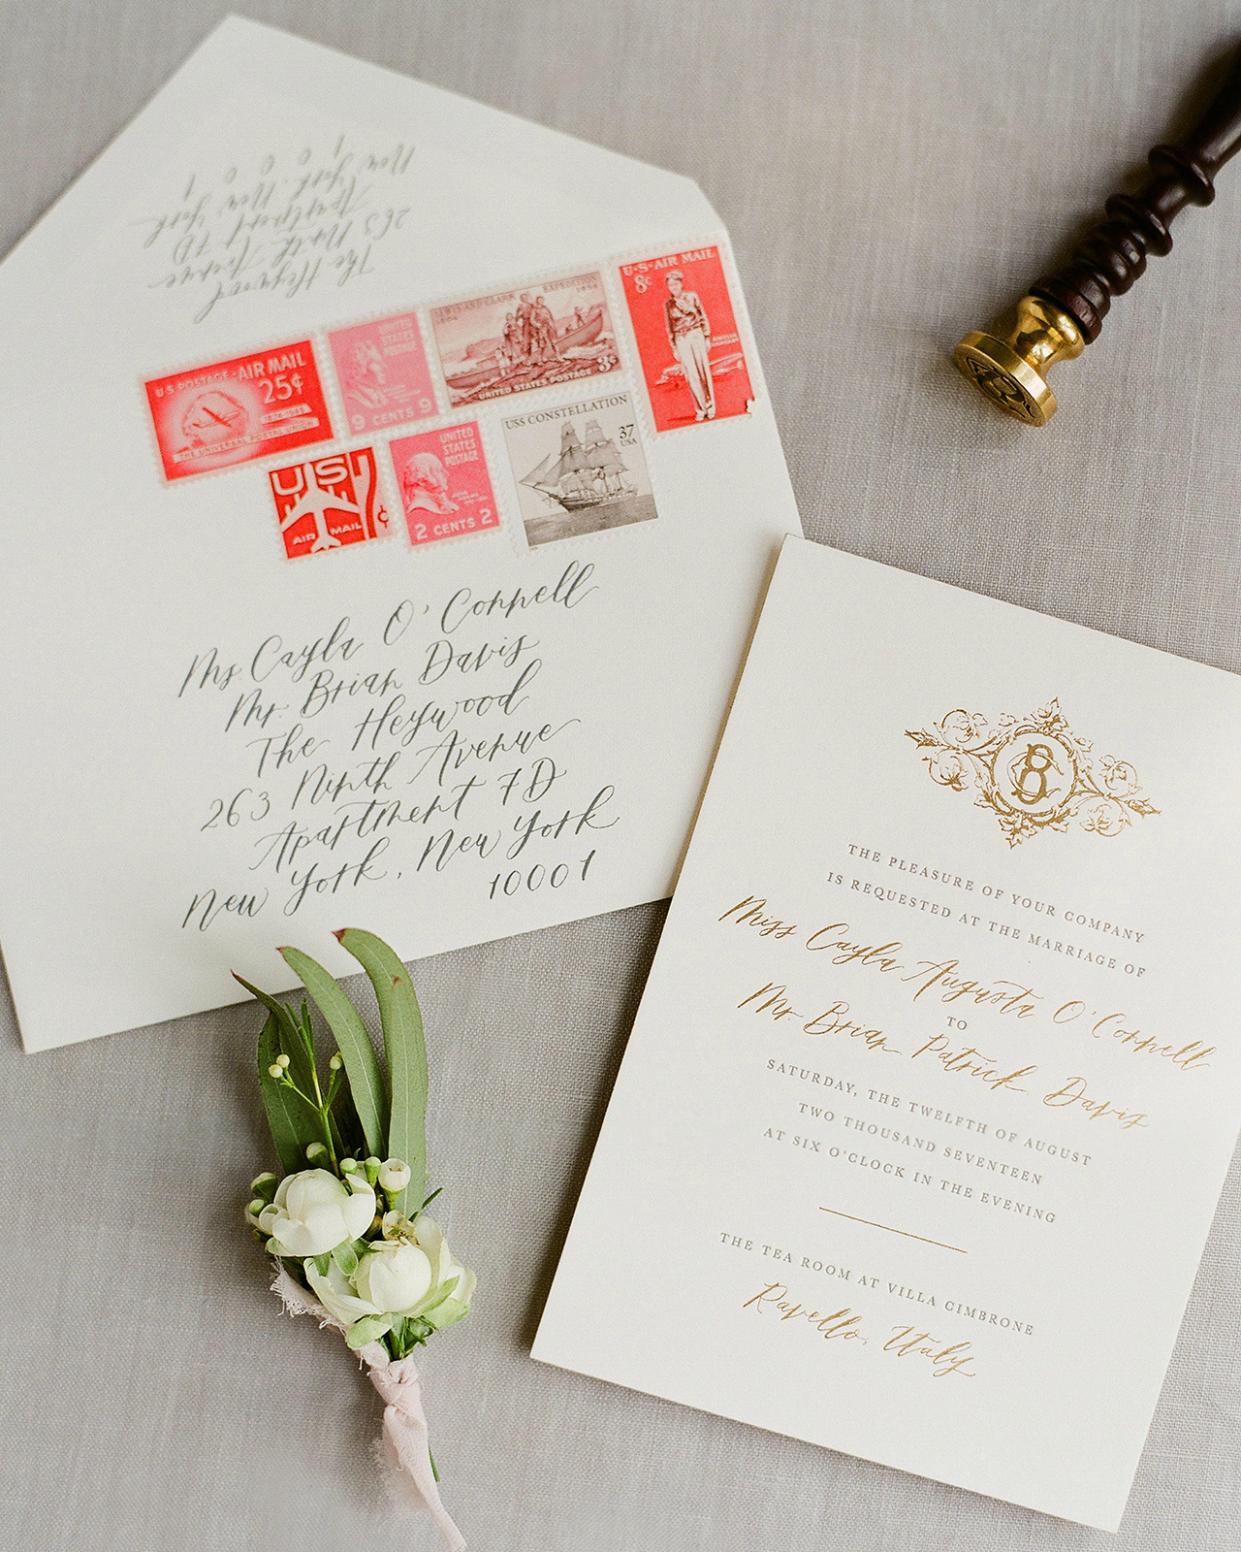 Awesome destination wedding invitations ideas jakartasearch